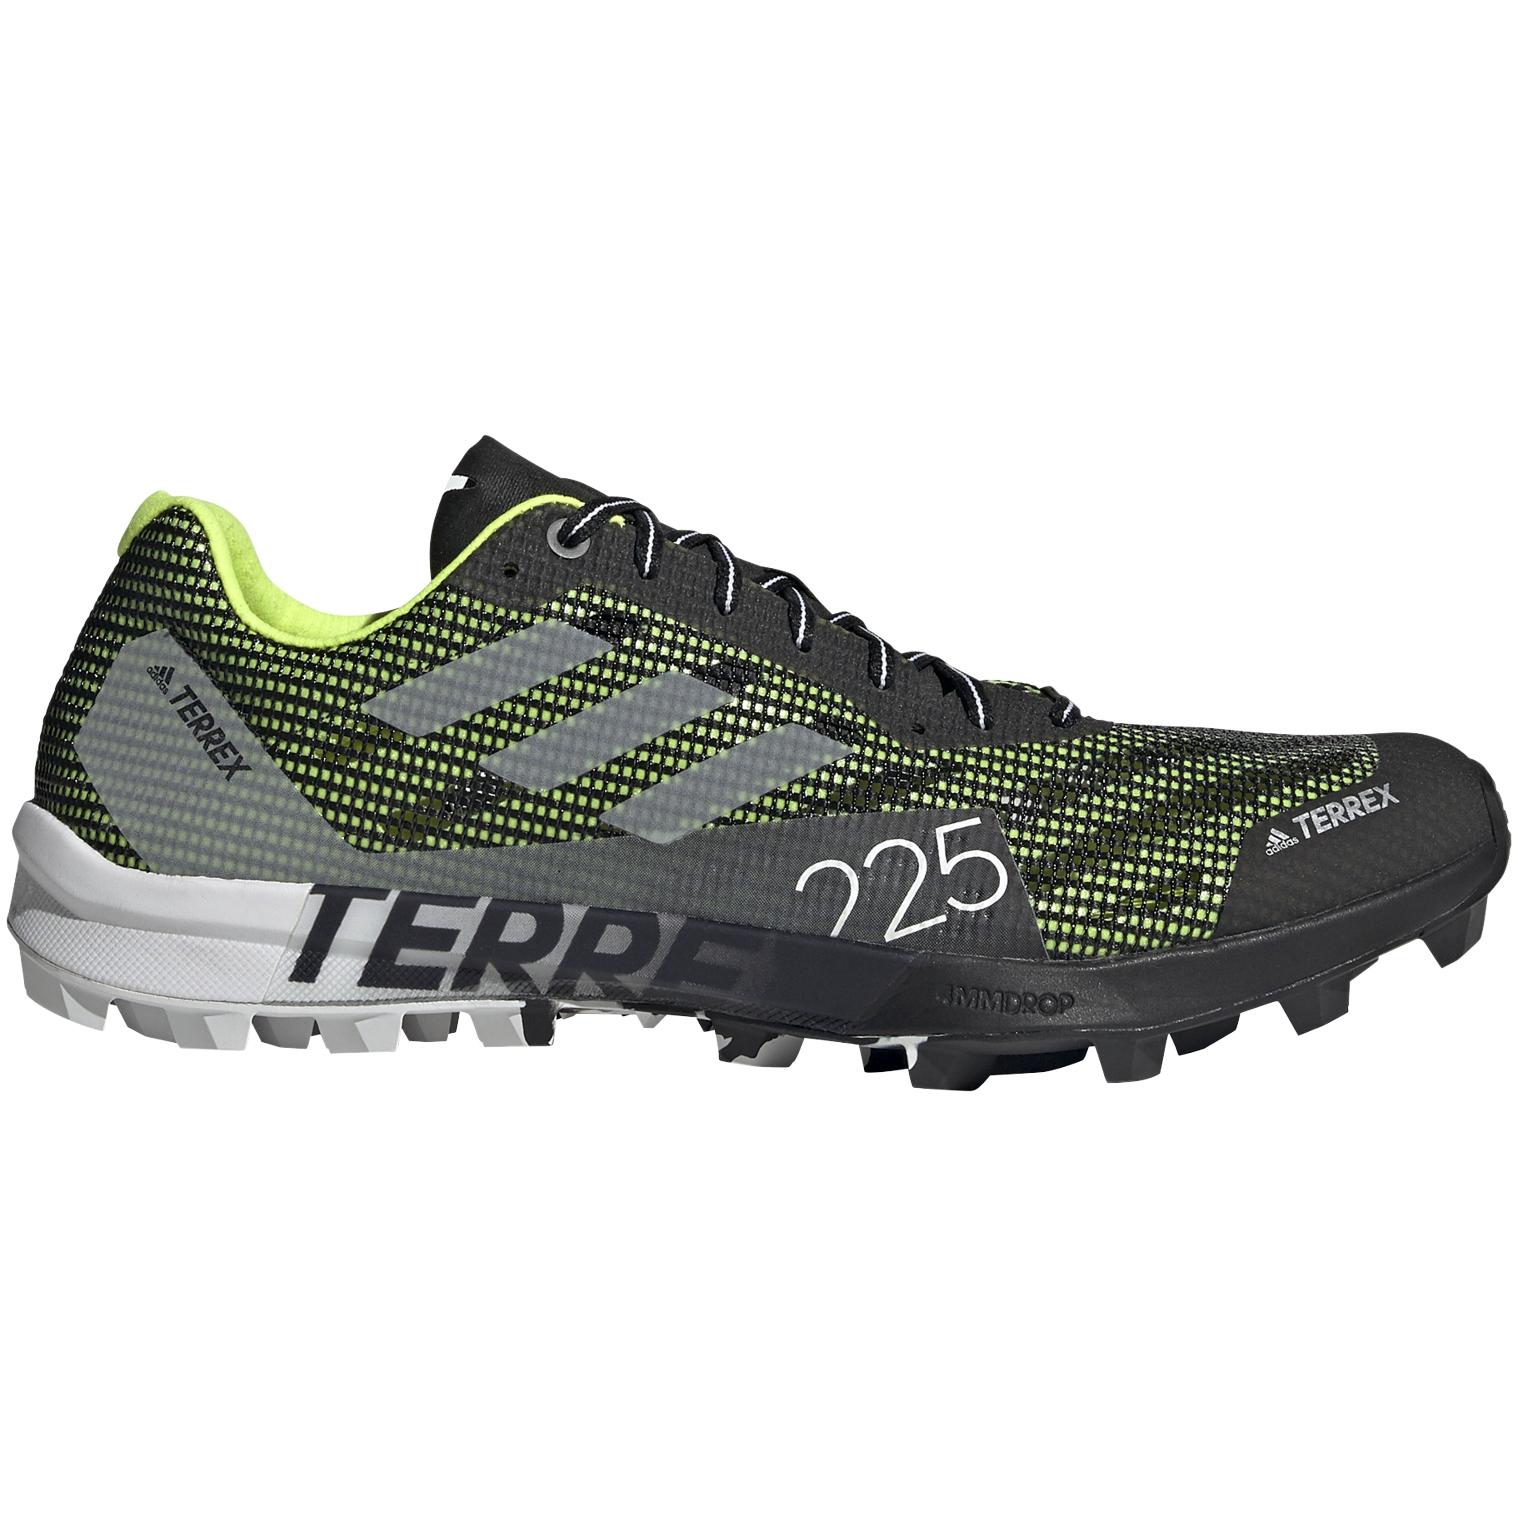 adidas Männer TERREX Speed SG Trailrunningschuhe - core black/ftwr white/solar yellow FW2870